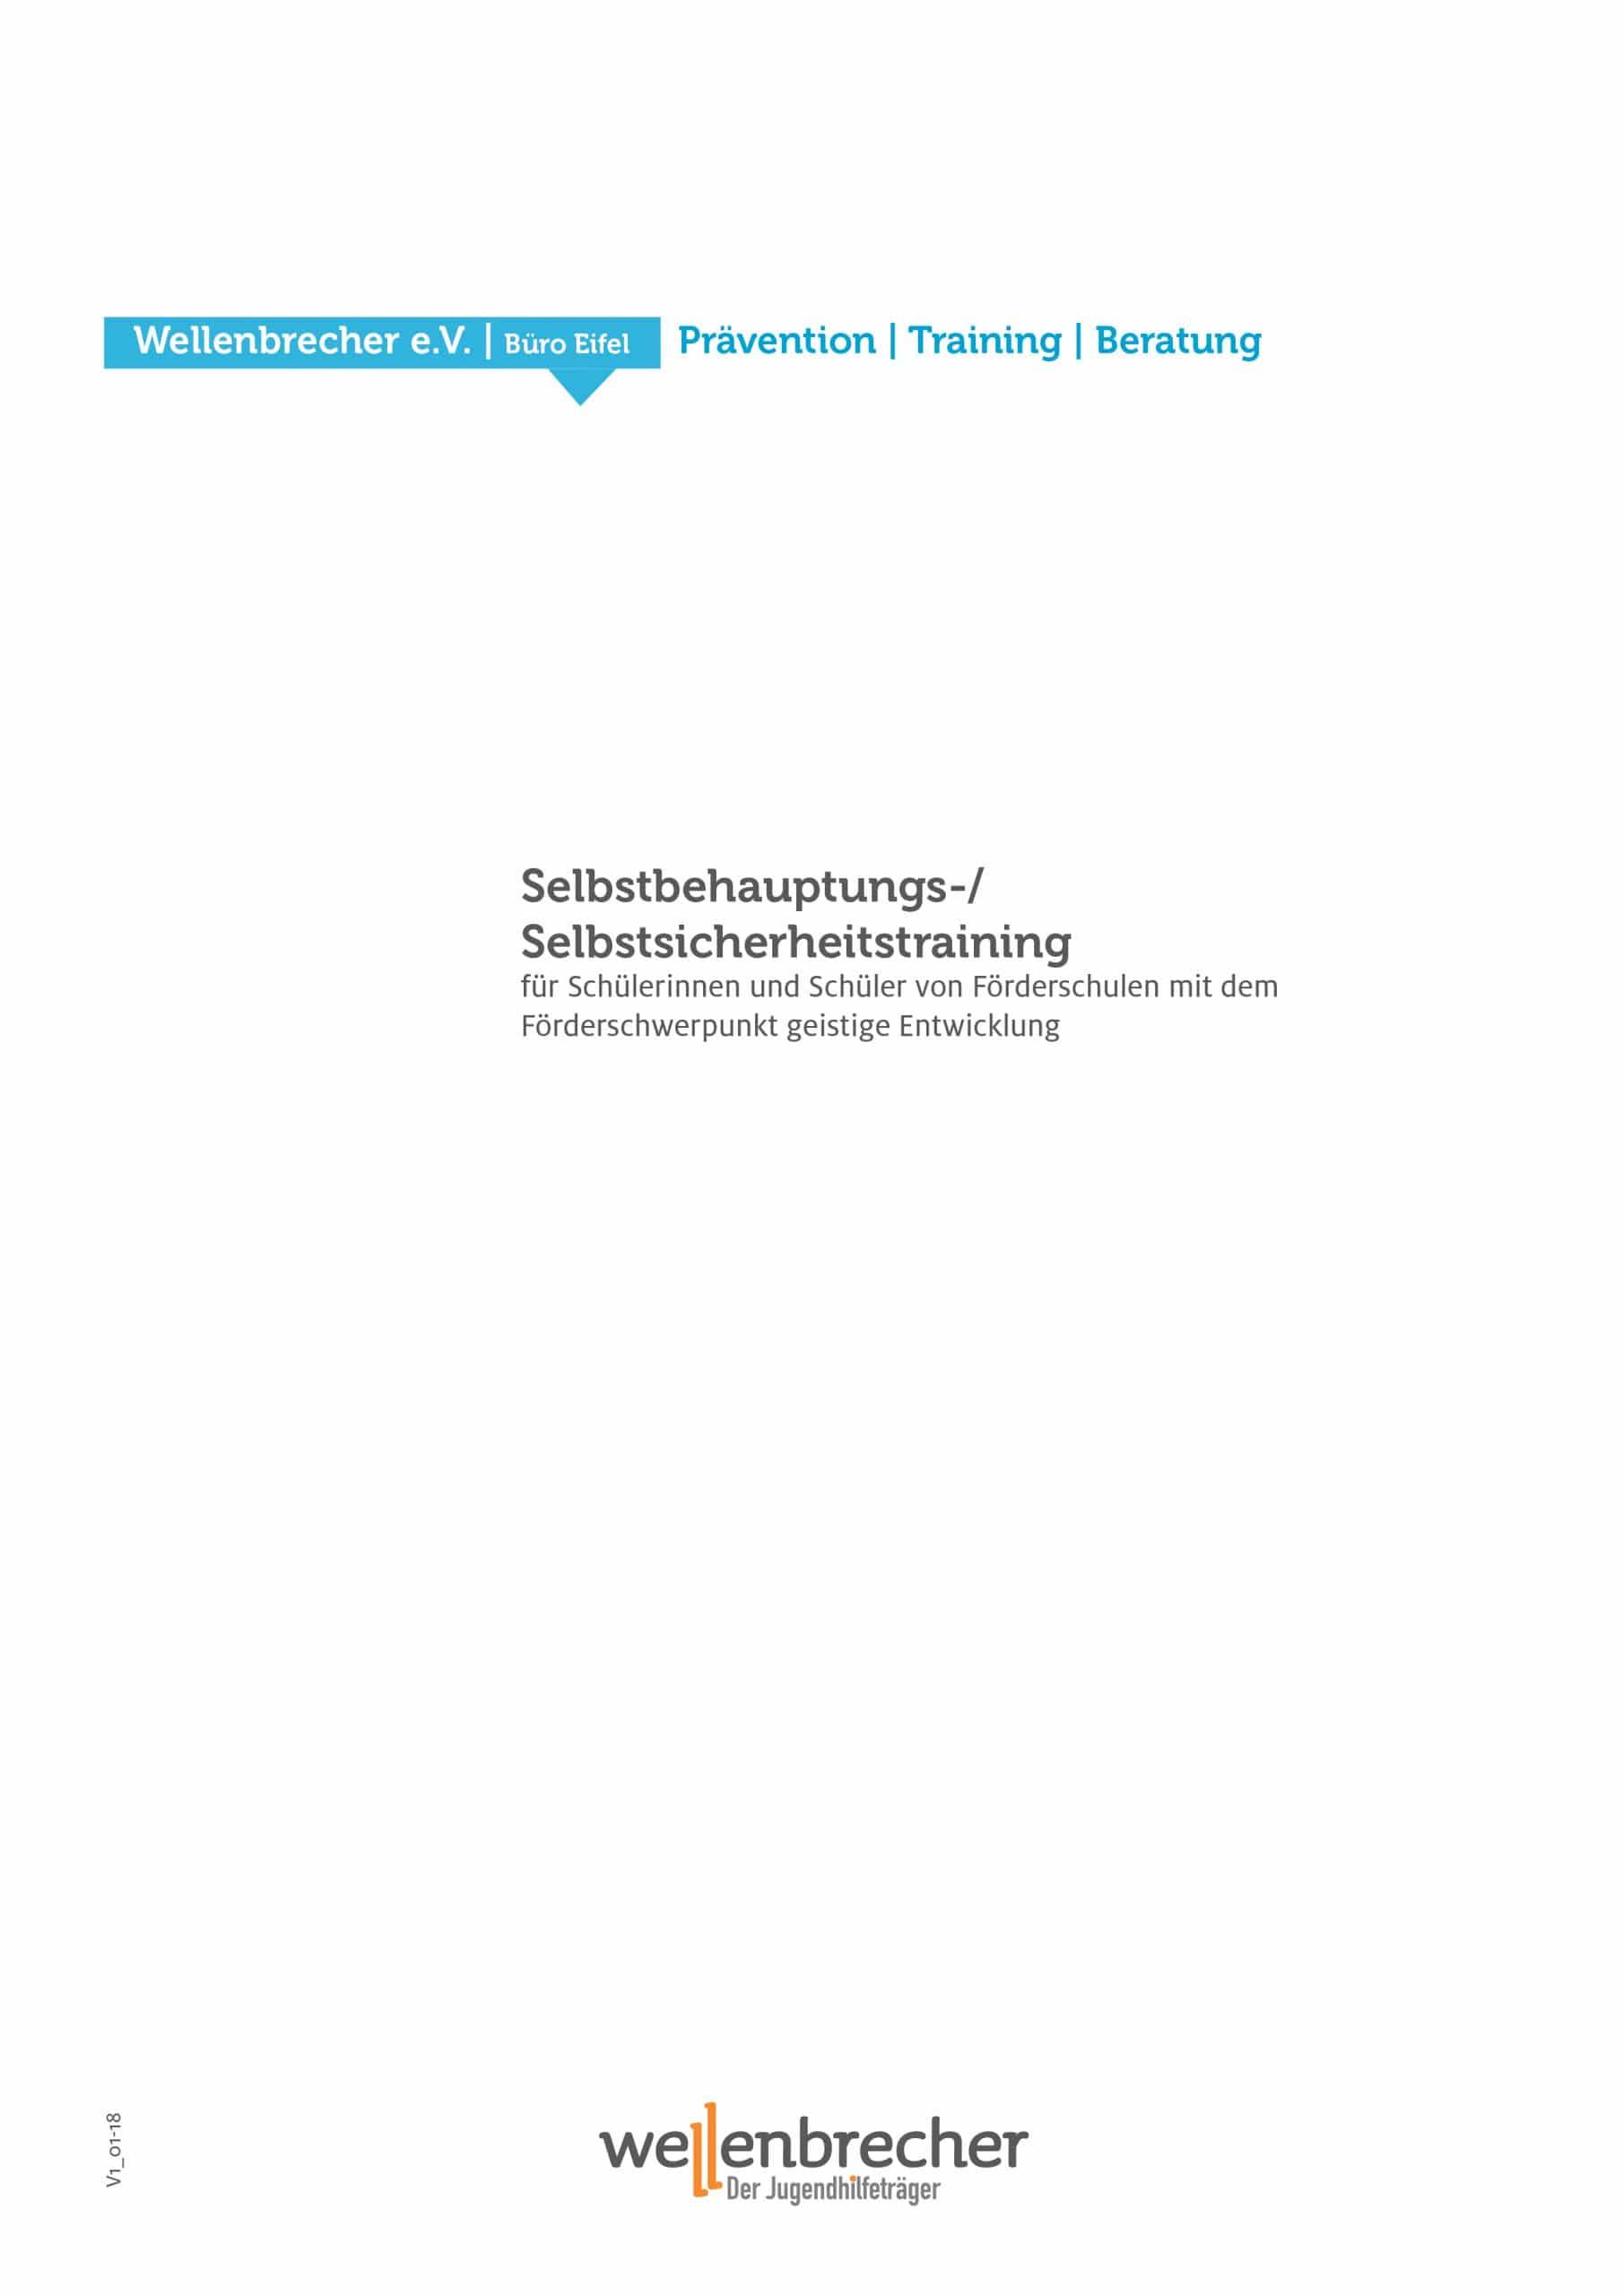 Fortbildung Selbstbehauptung Schülerinnen und Schüler